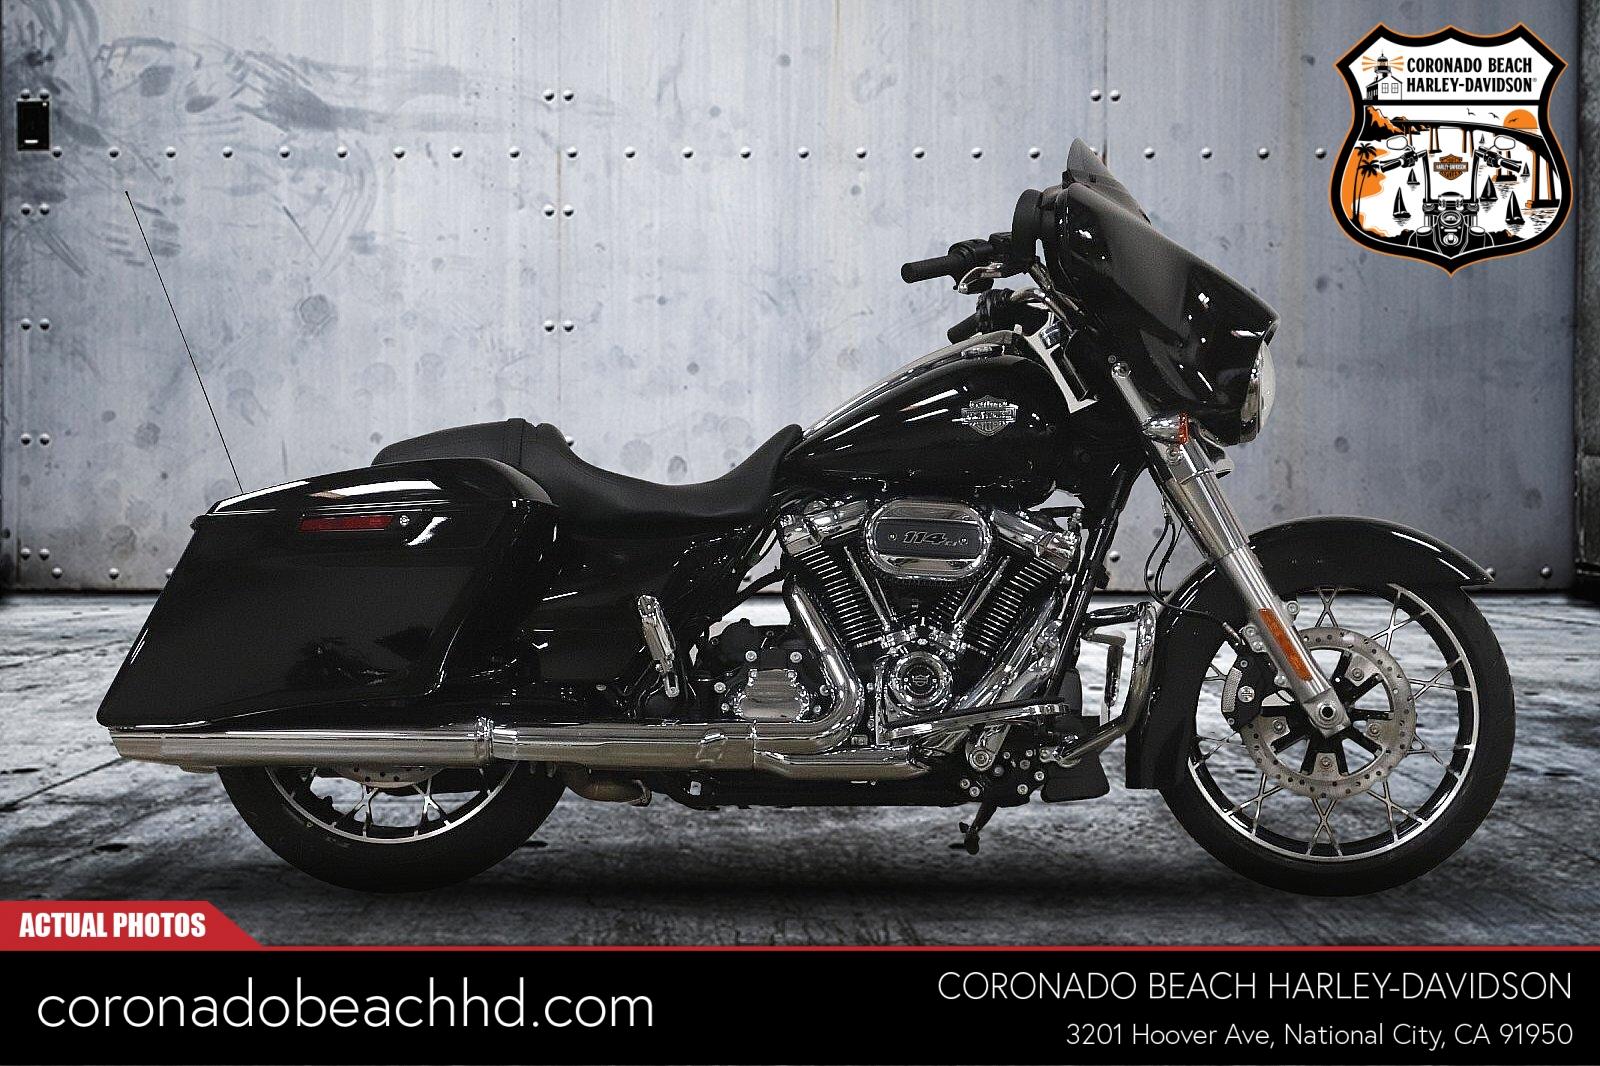 2021 Harley-Davidson Street Glide Special [34]